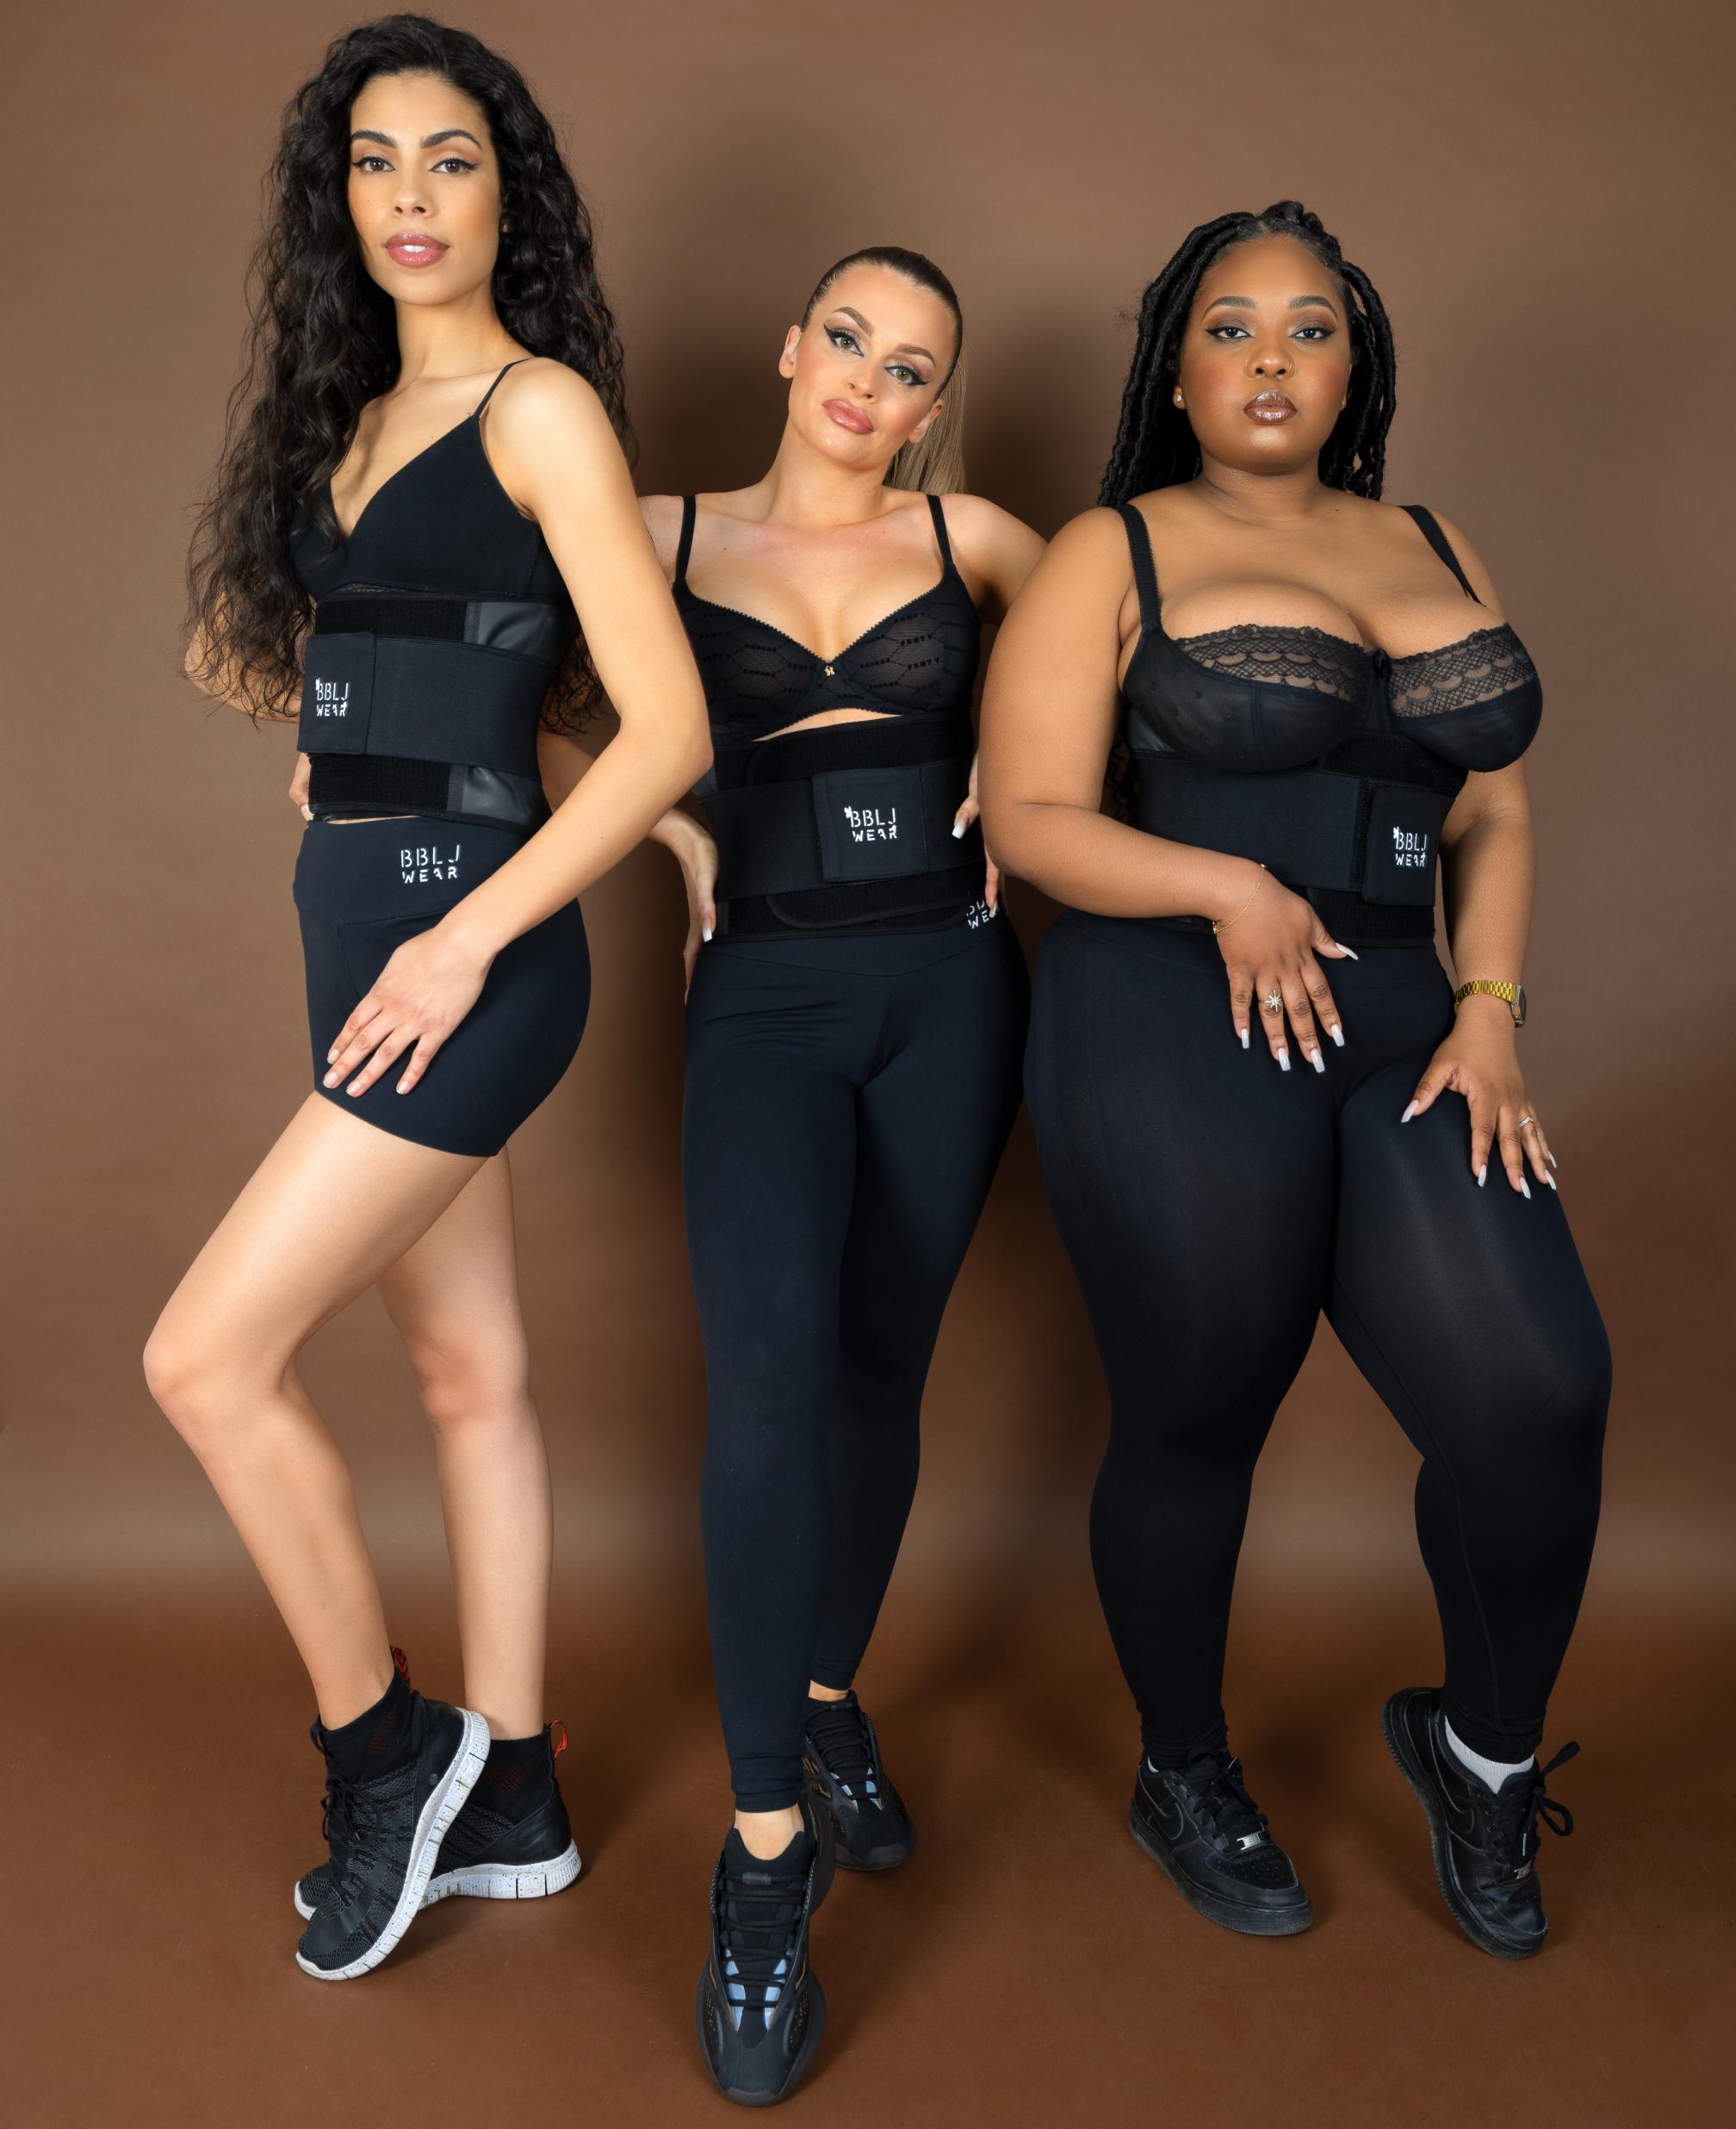 gaine-fitness-lifestyle-trio